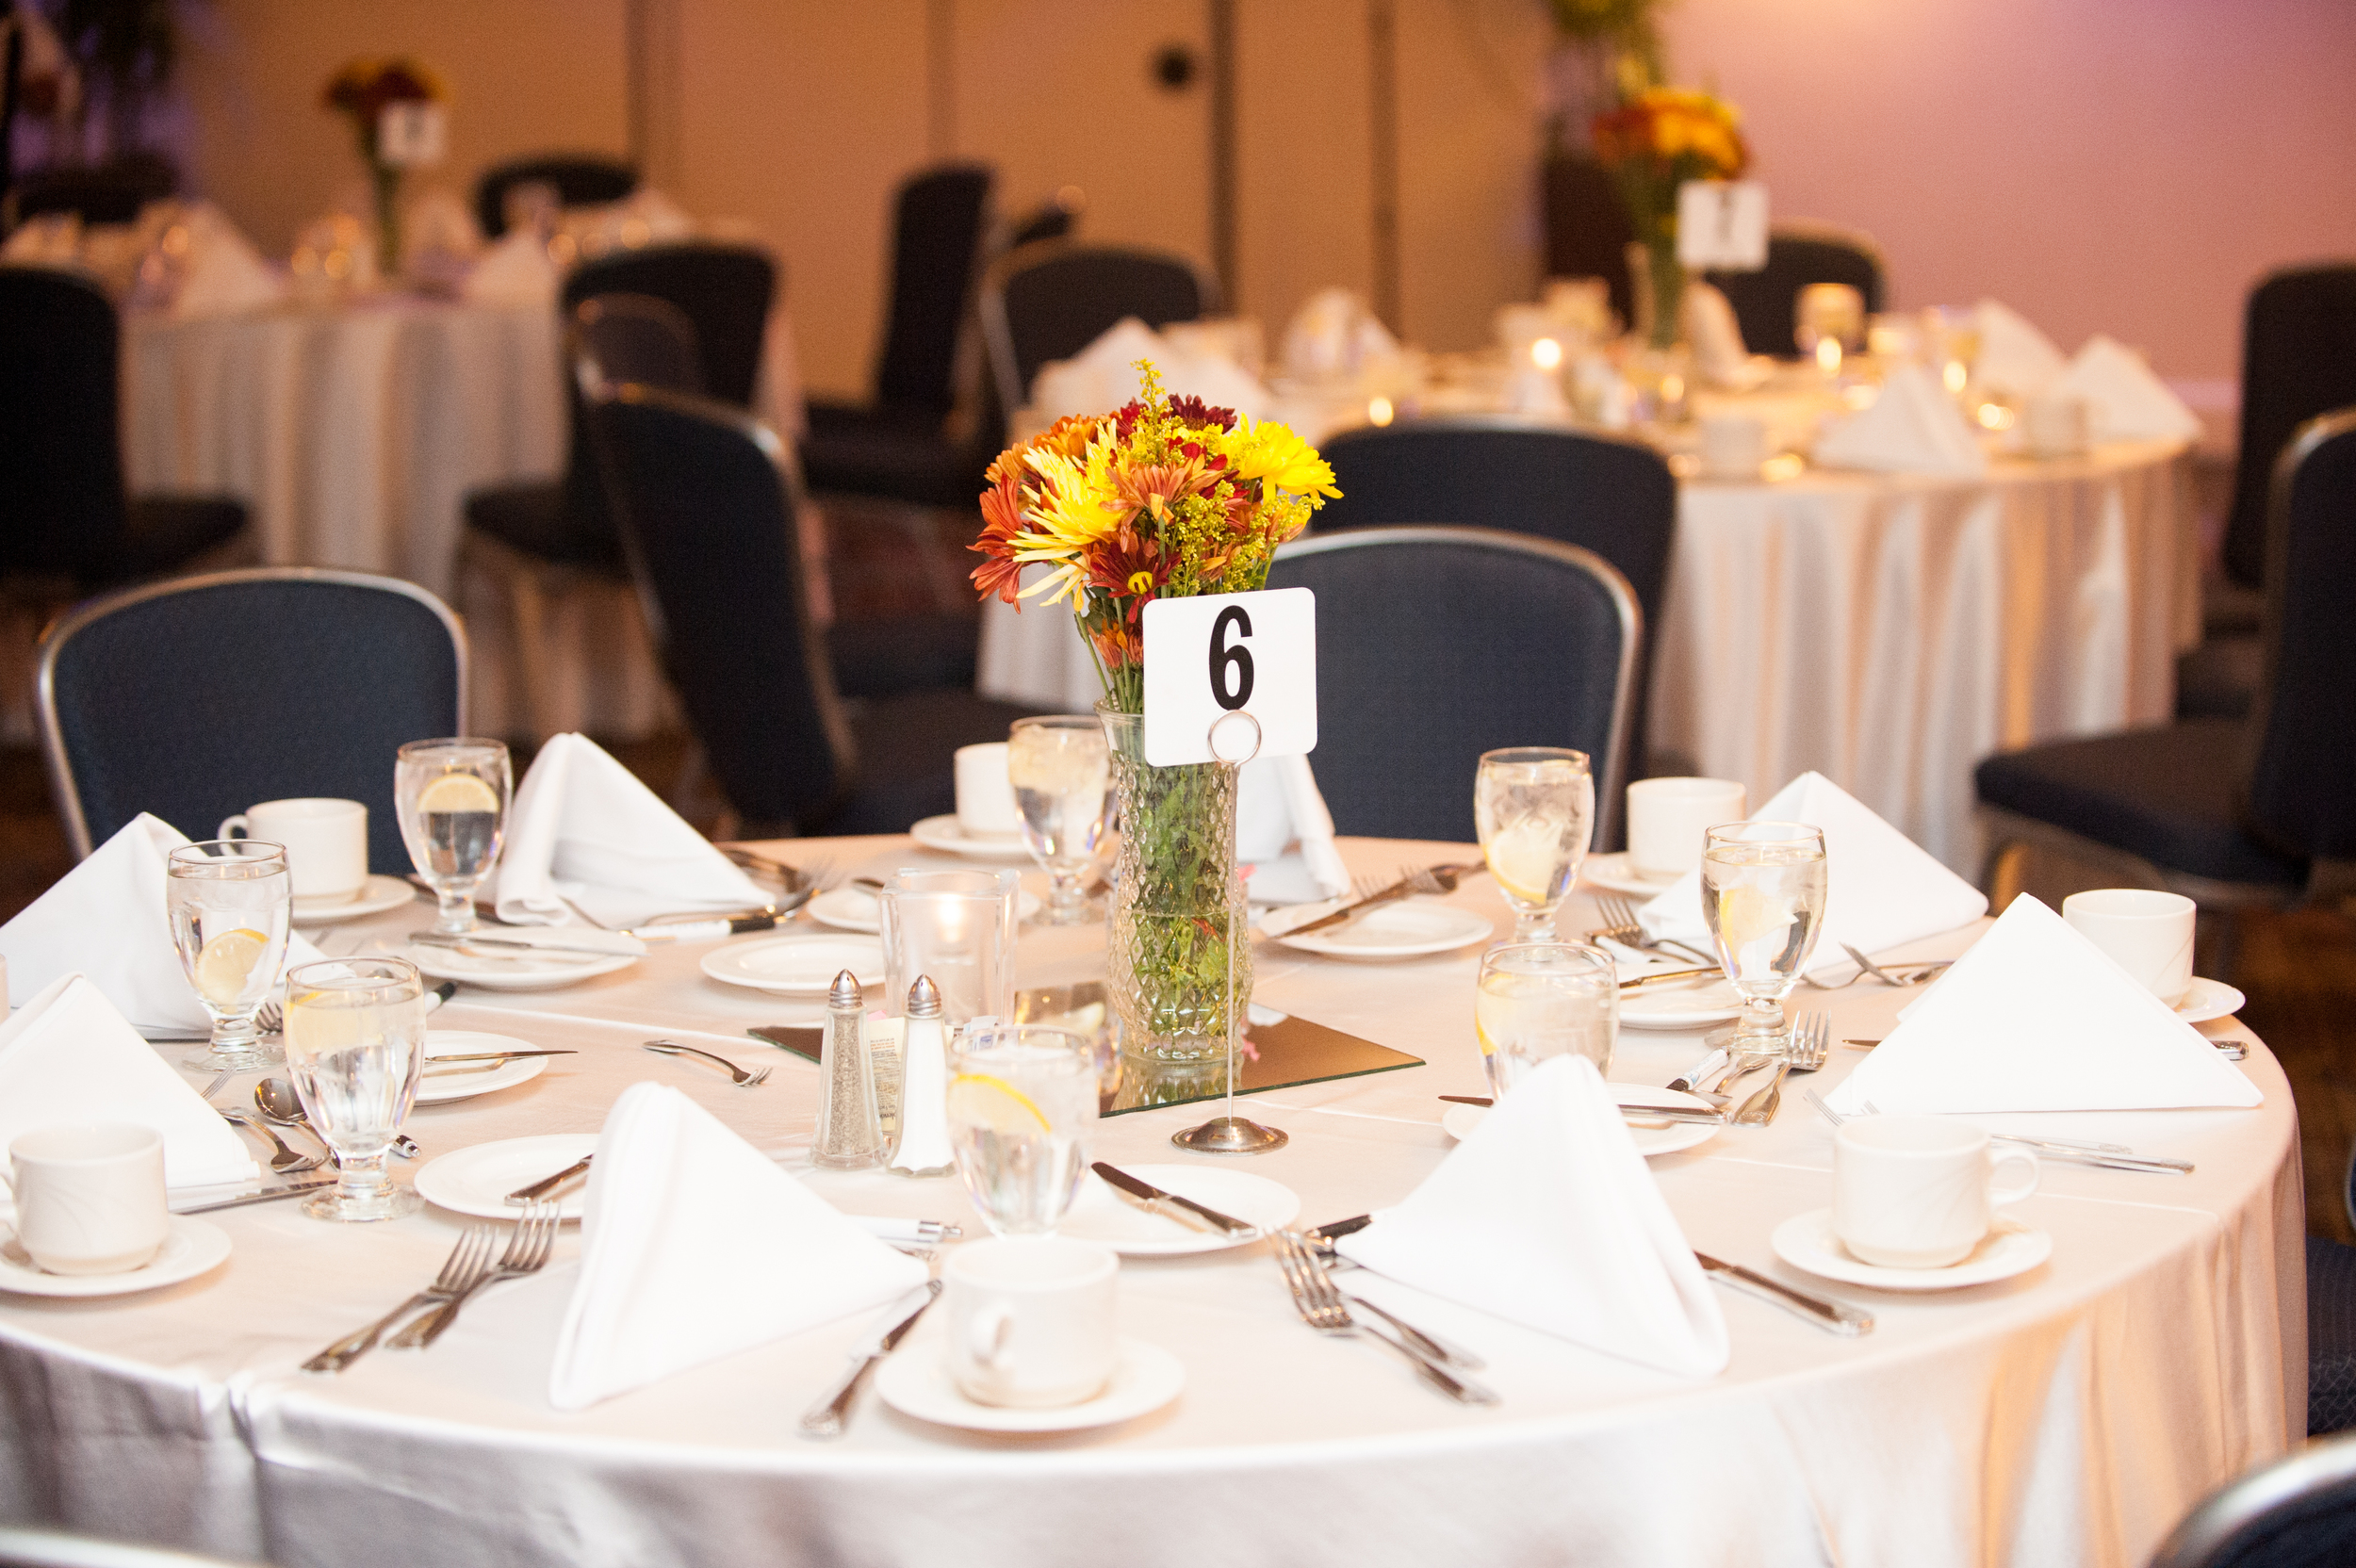 2014-11-15-ABACS Annual Dinner-38.jpg